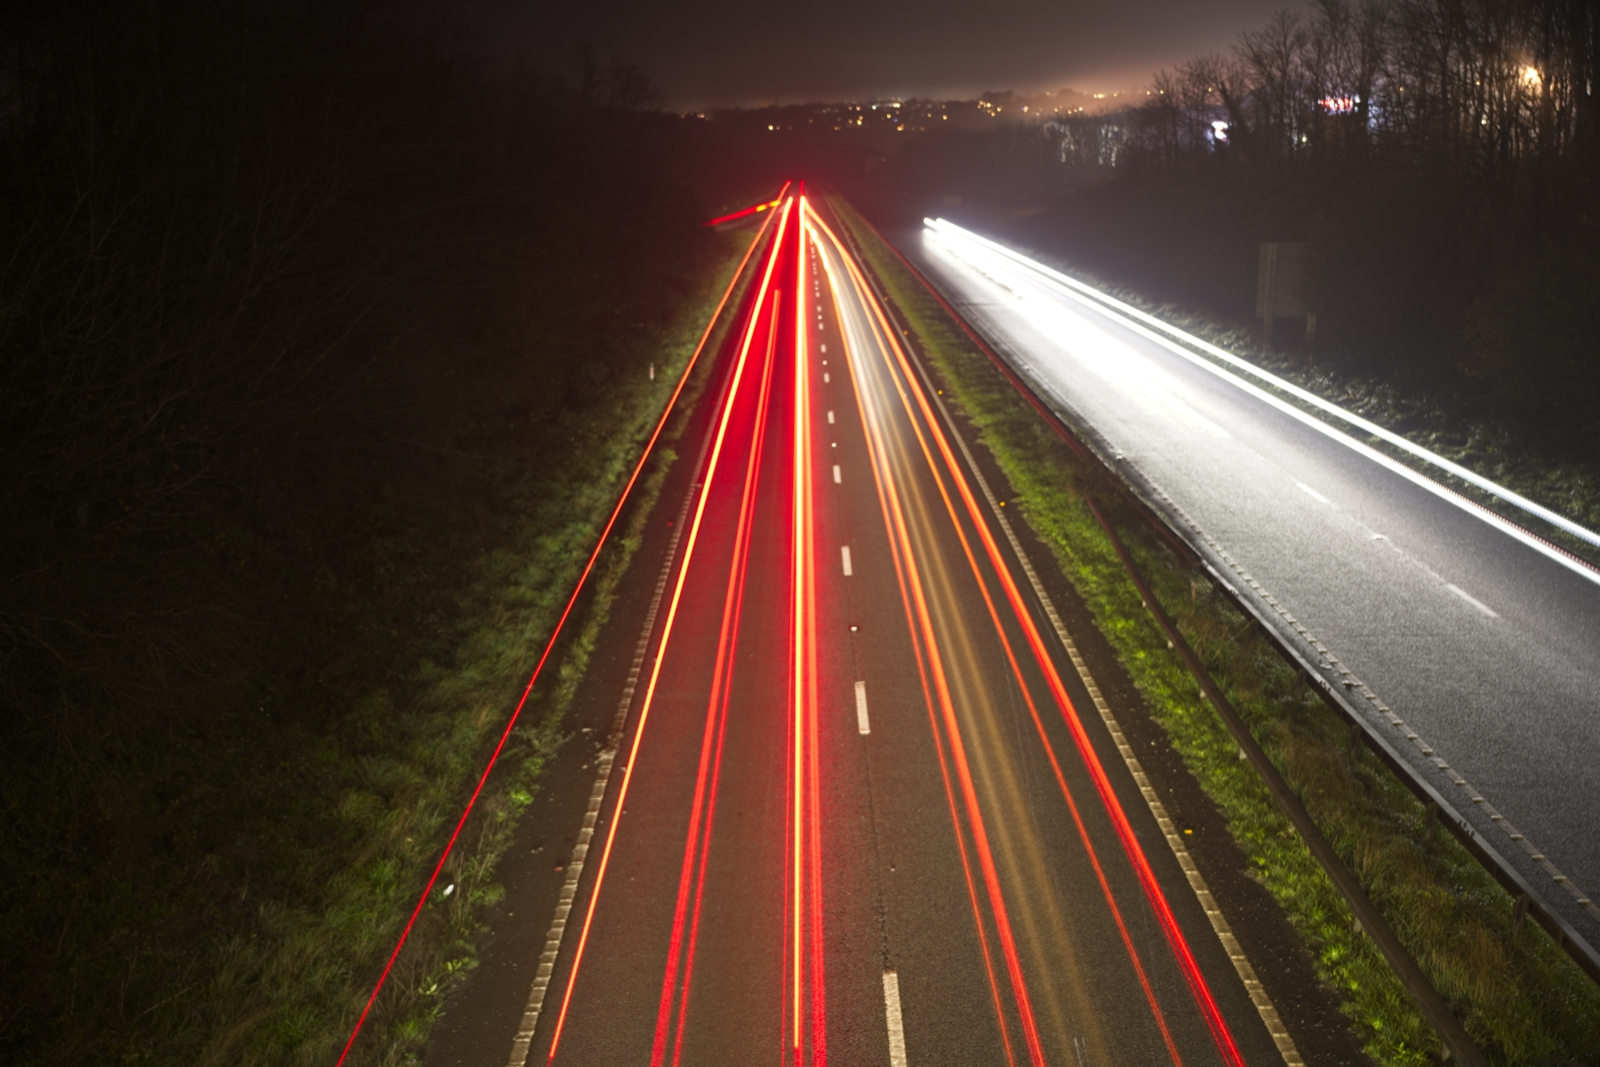 KF2 Off Camera - Foggy Drive home - Paul